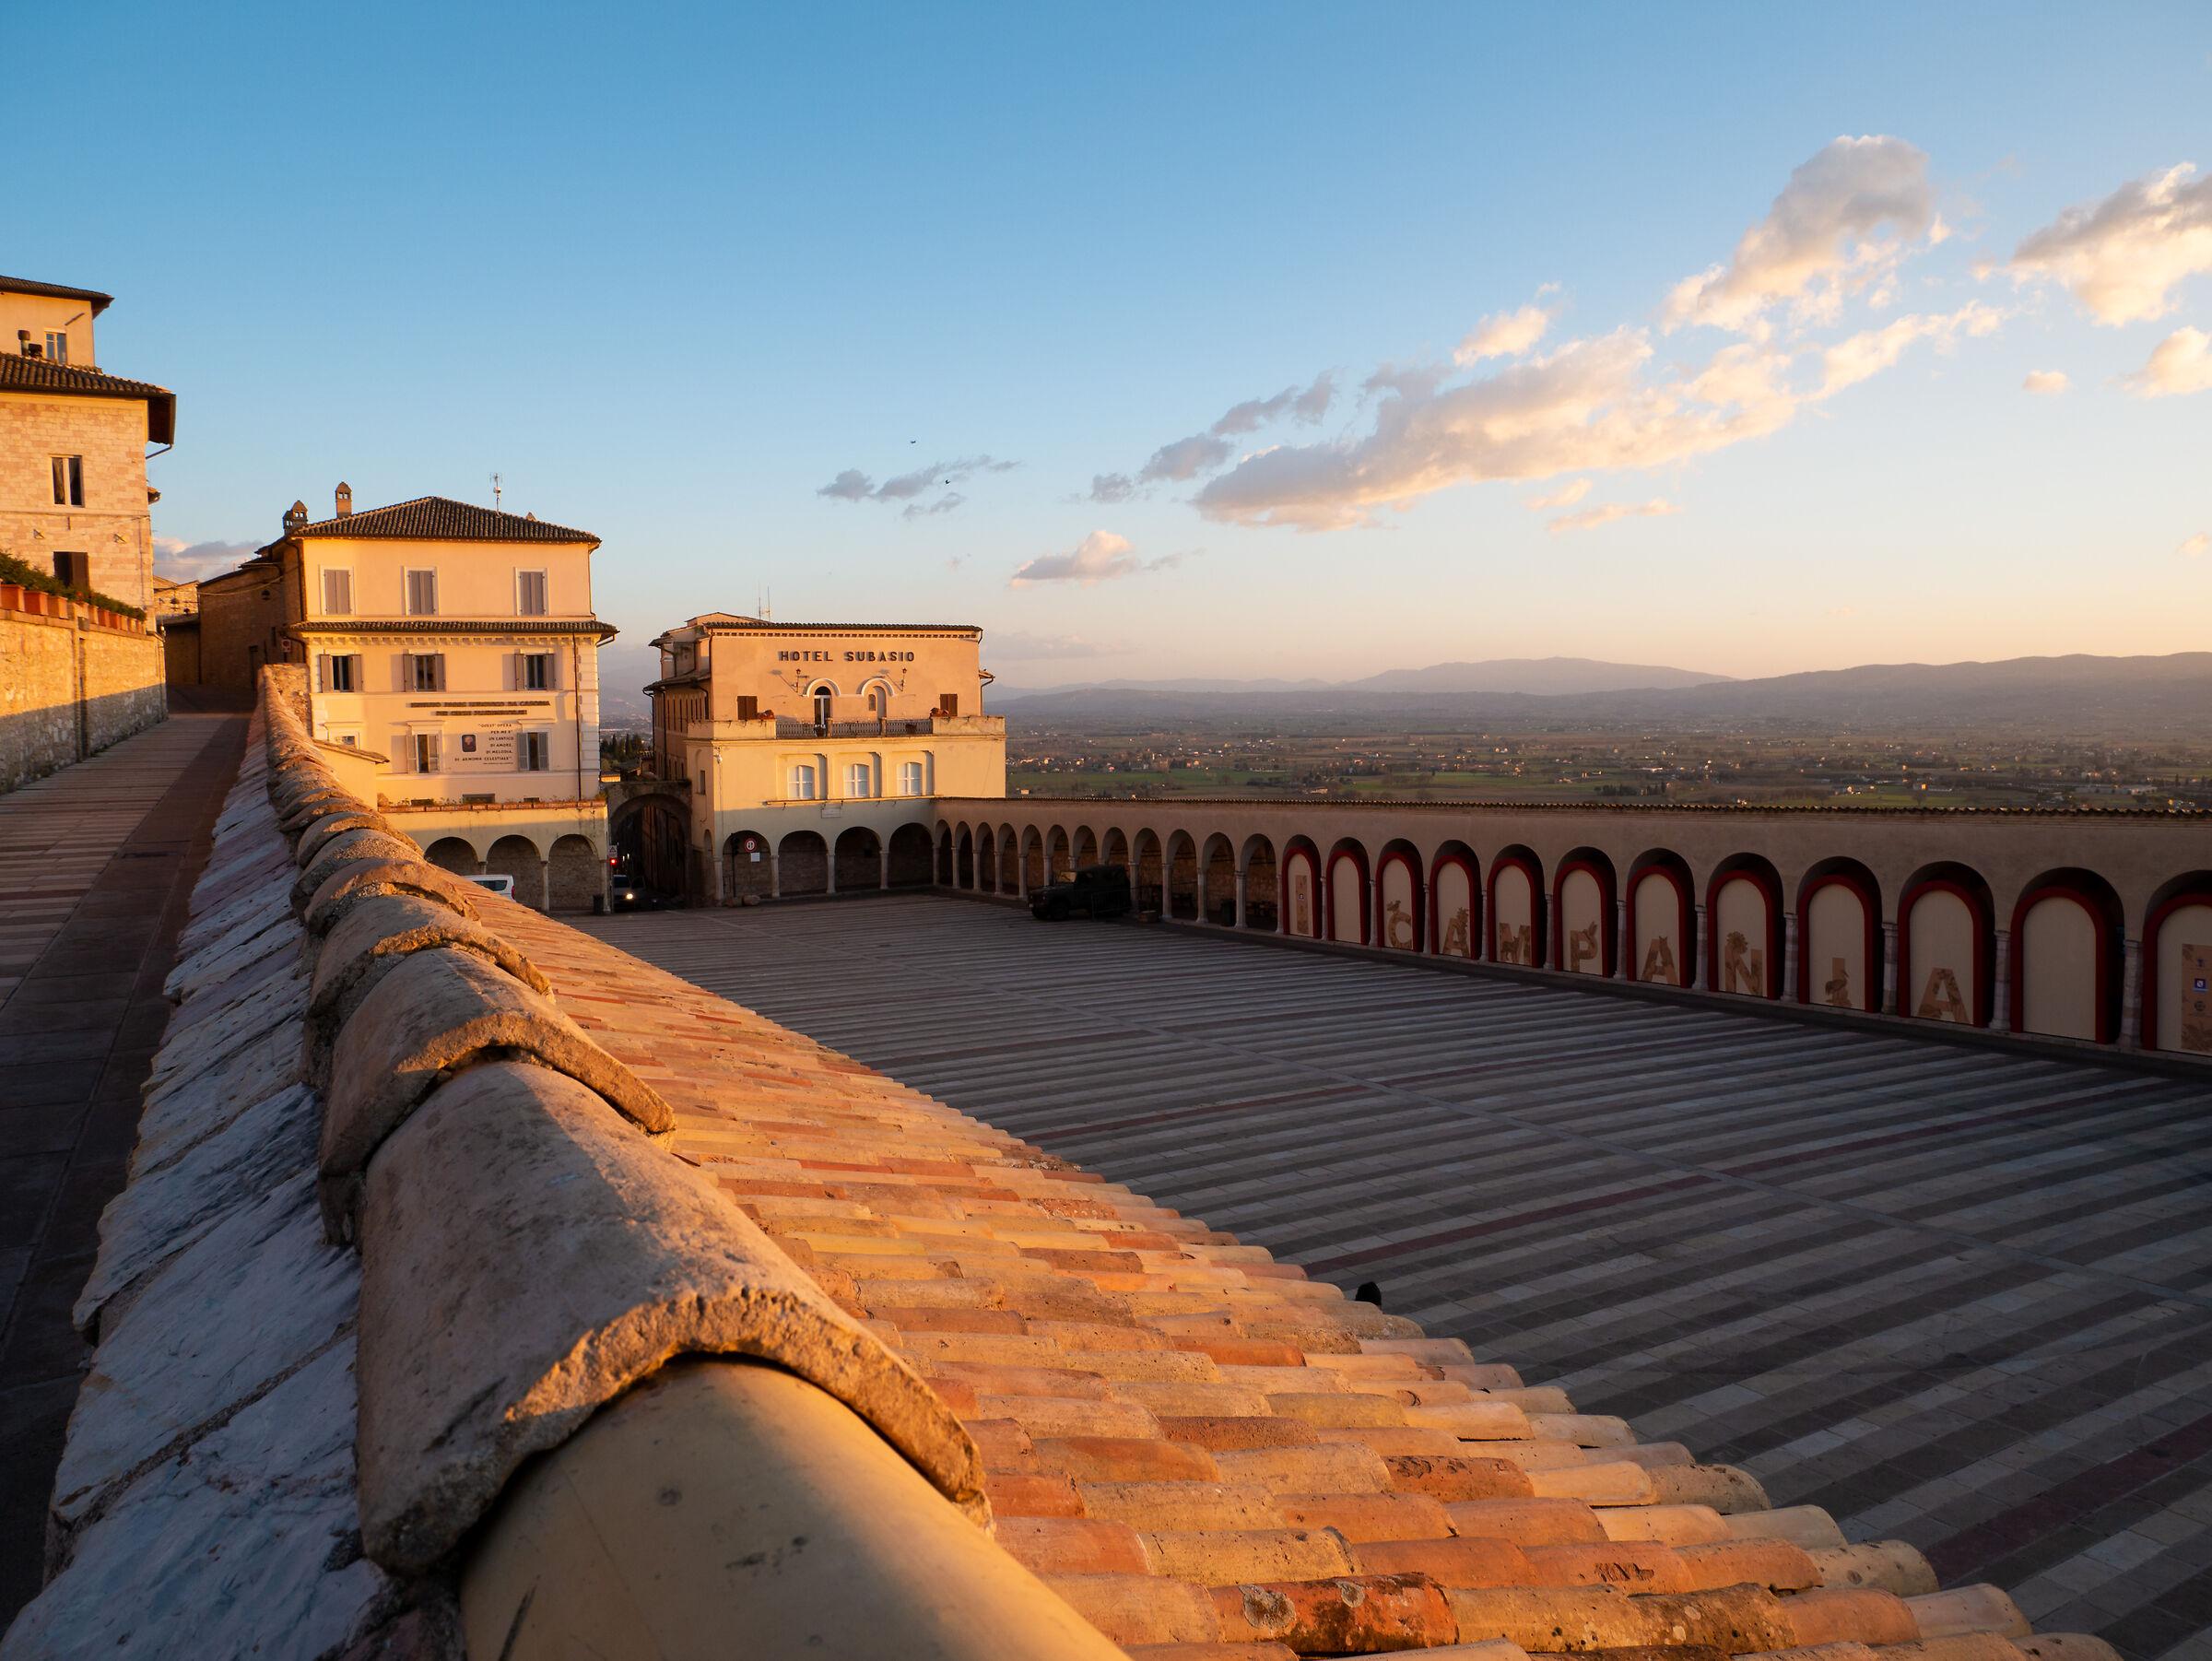 Vista dalla Basilica di S. Francesco di Assisi...